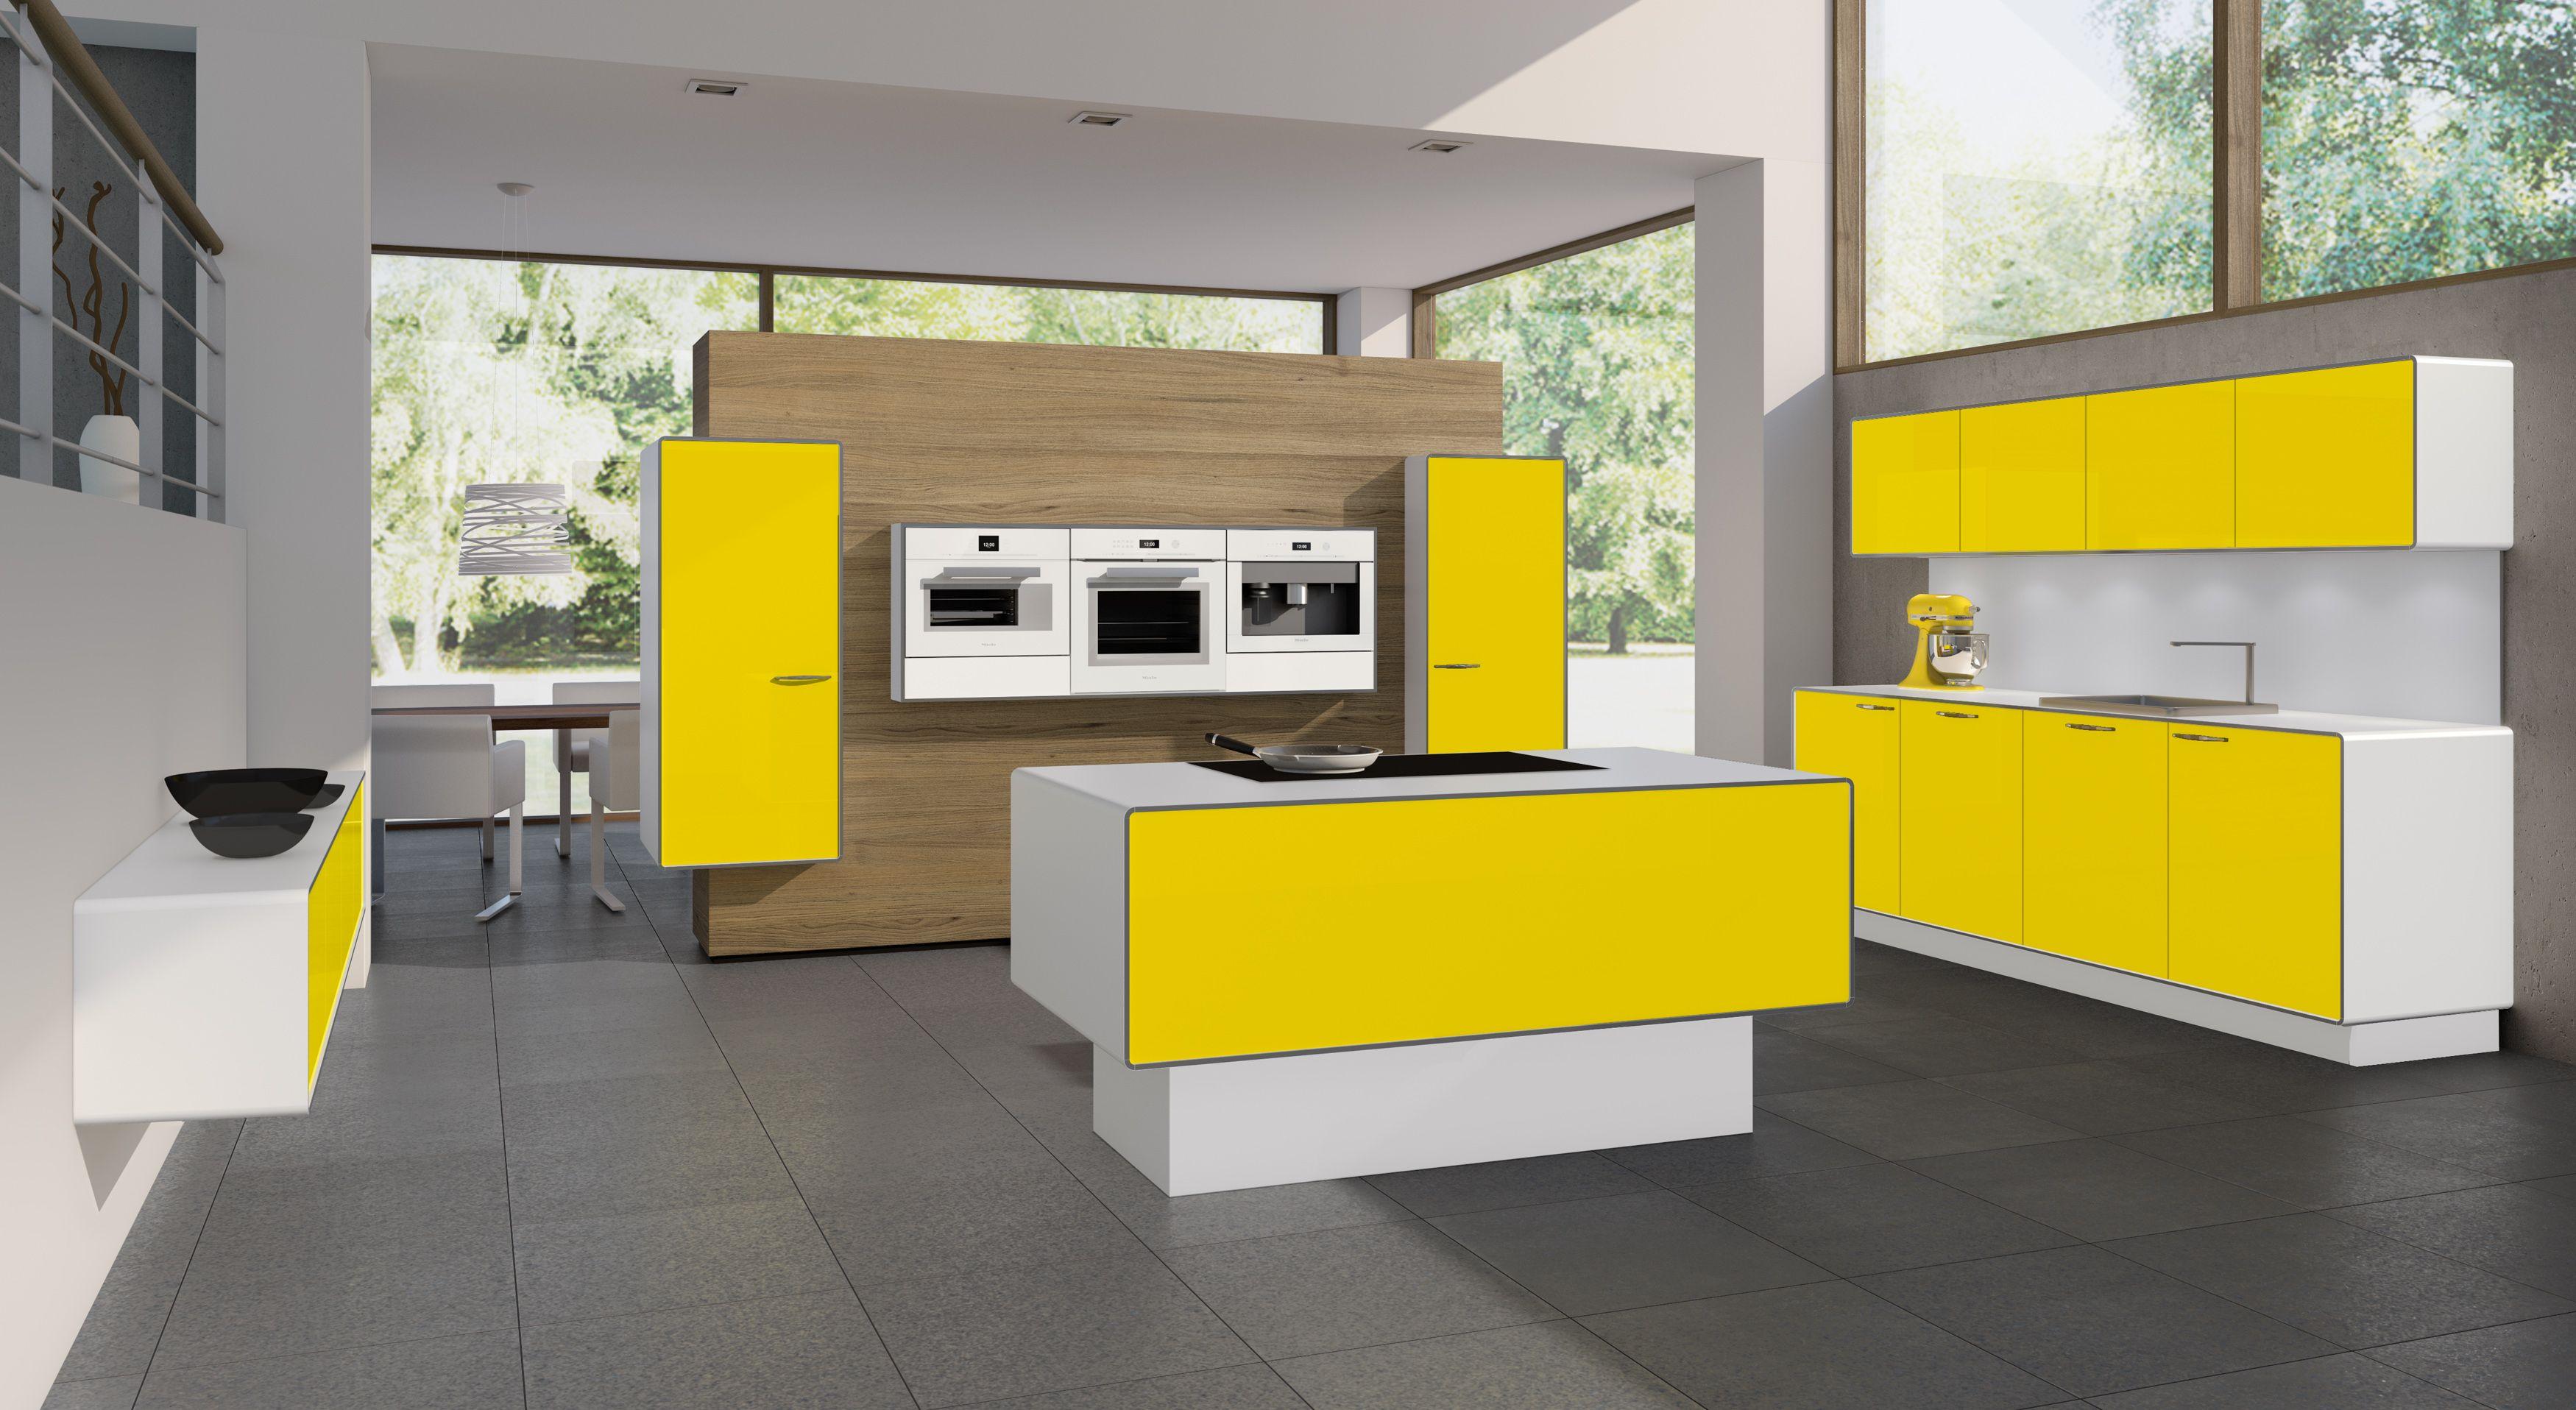 Pin By Allmilmo Kitchens On Pia By Allmilmo Home Decor Kitchen Design Design